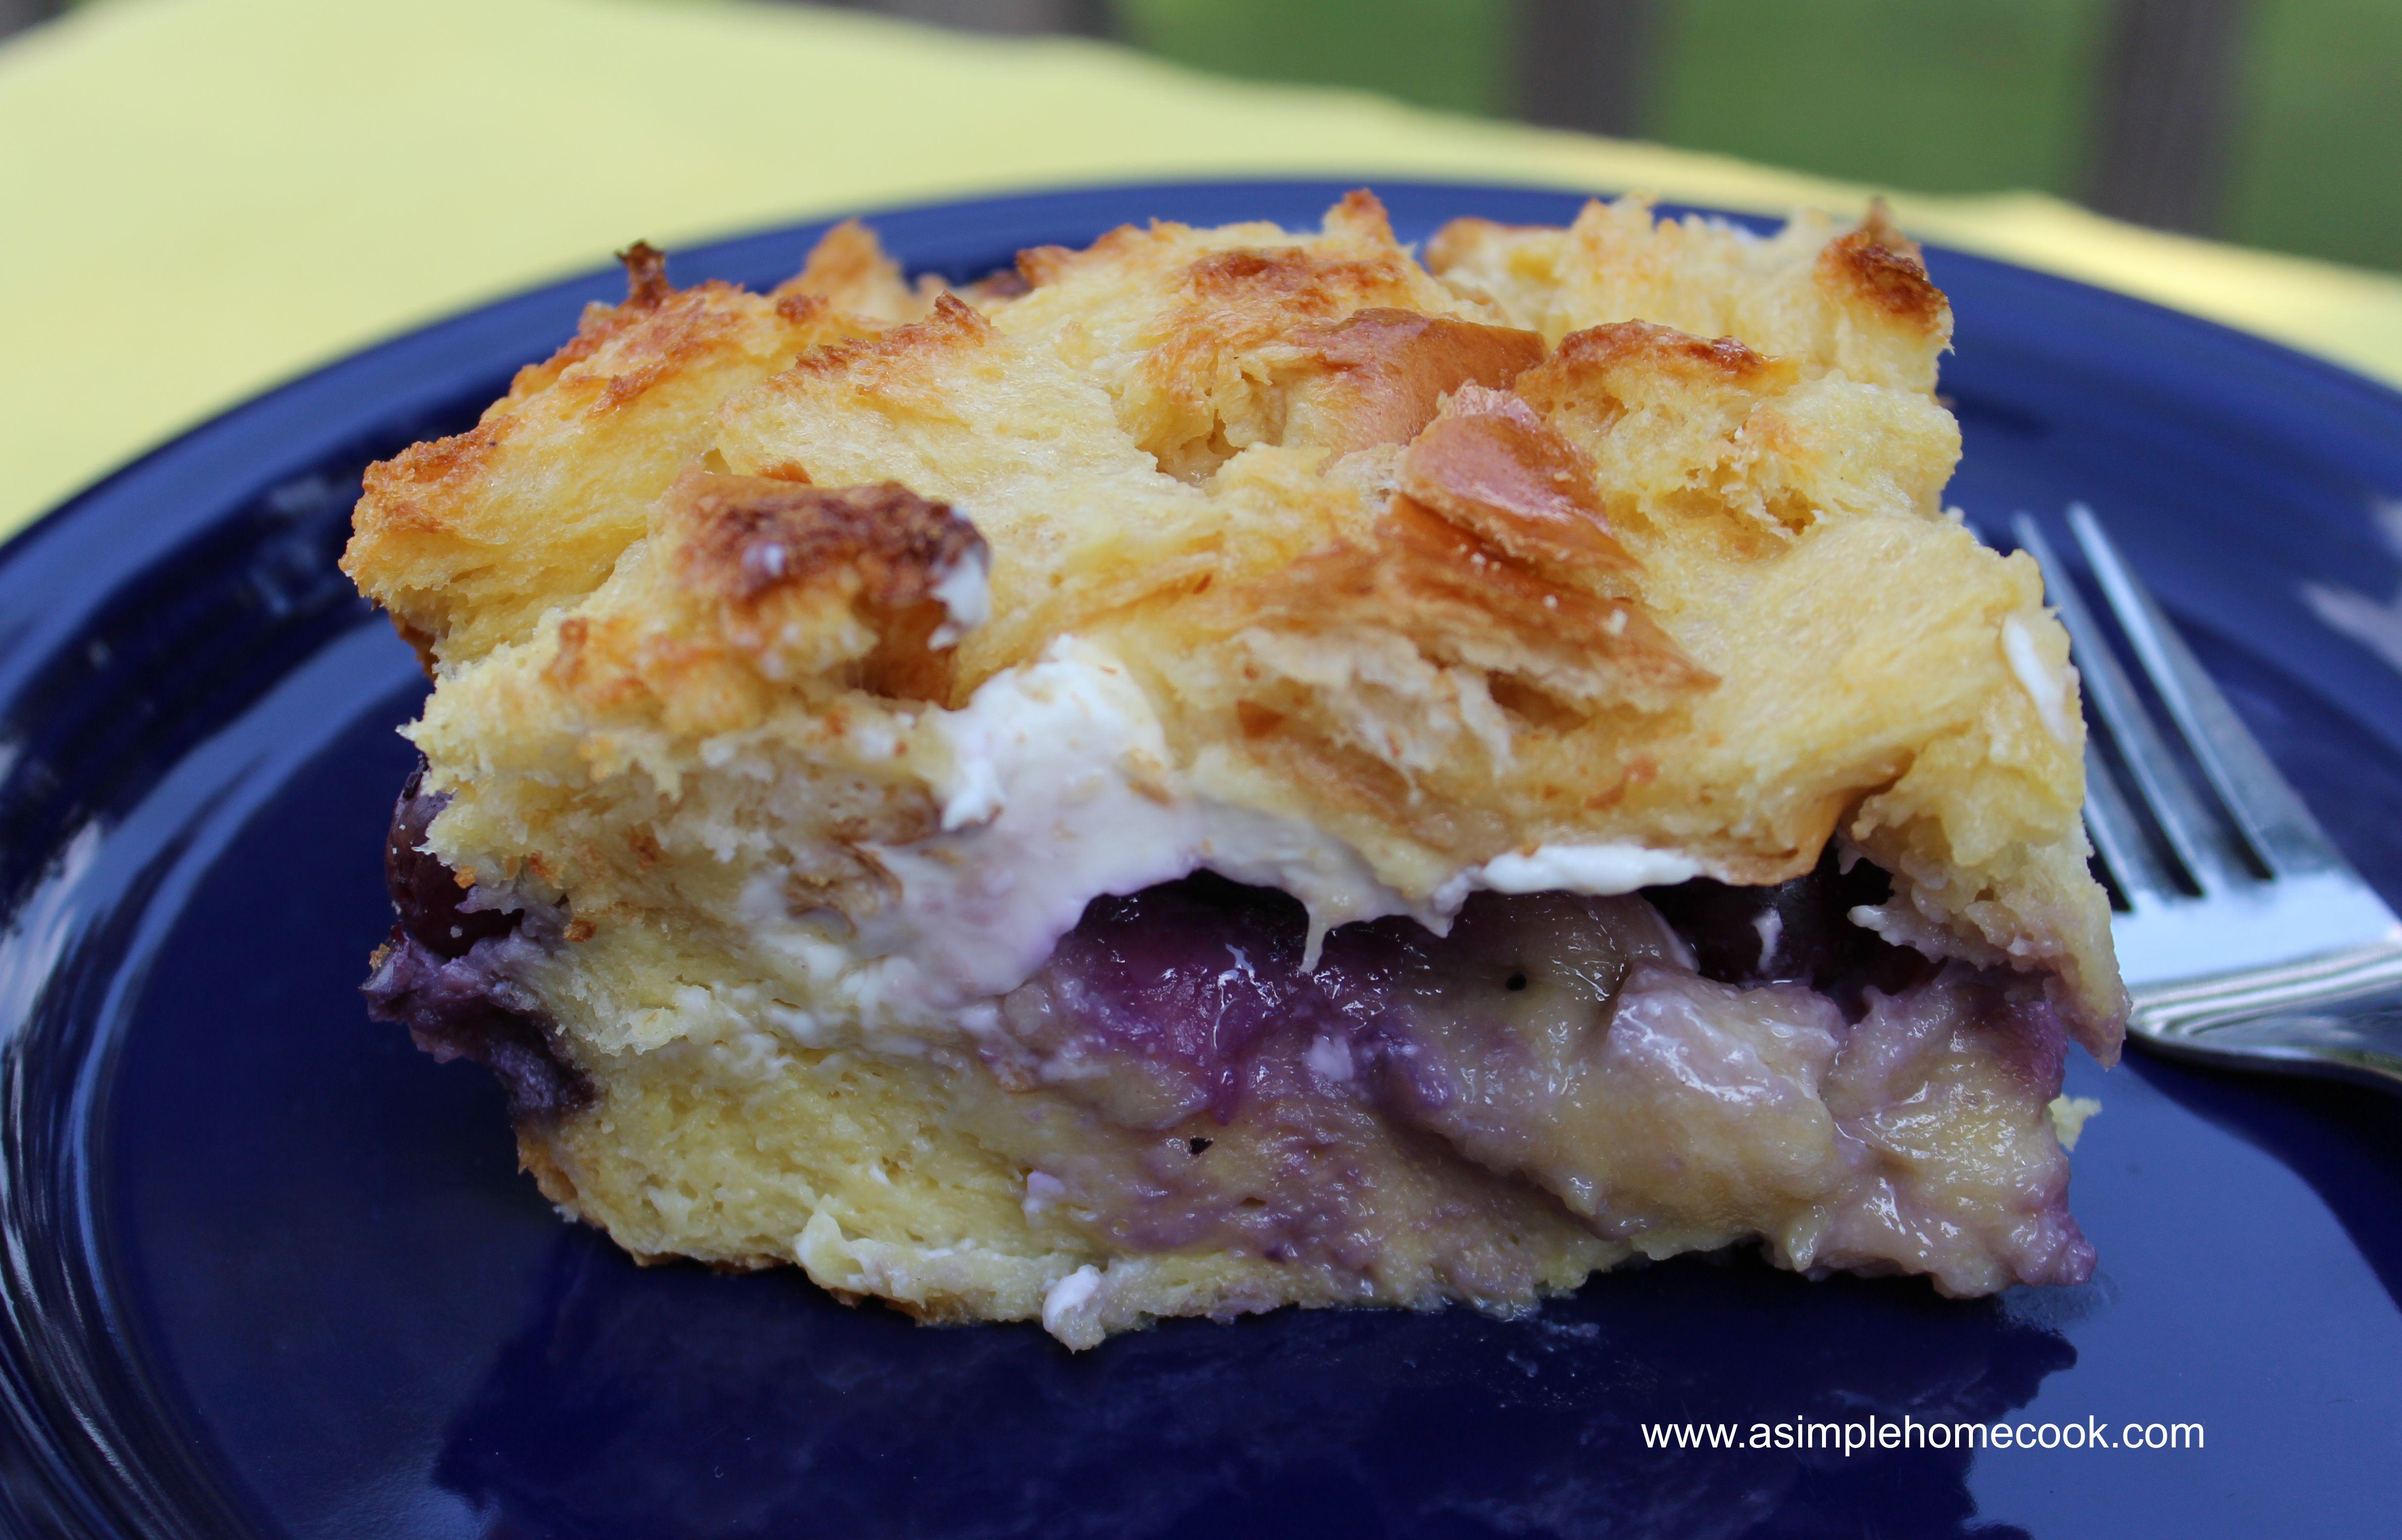 Blueberry Stuffed French Toast Casserole